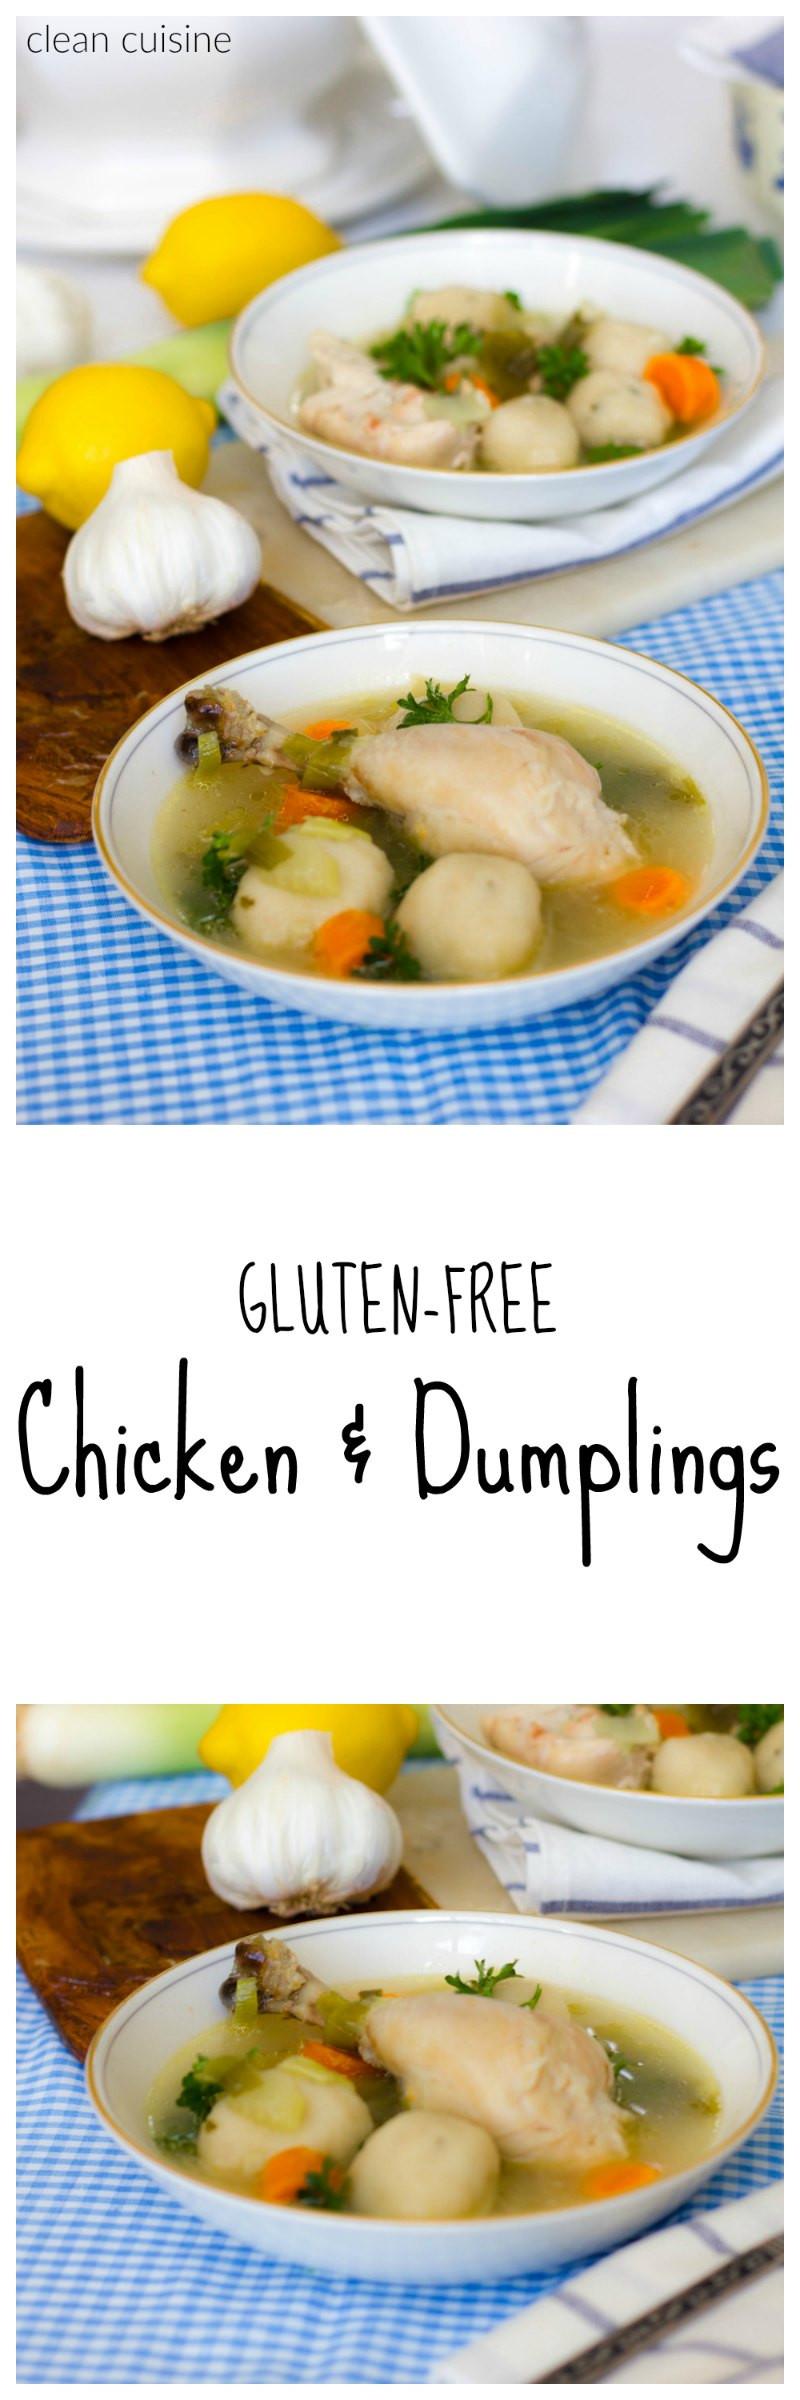 Gluten Free Chicken And Dumplings  Recipe for the Best Gluten Free Chicken and Dumplings